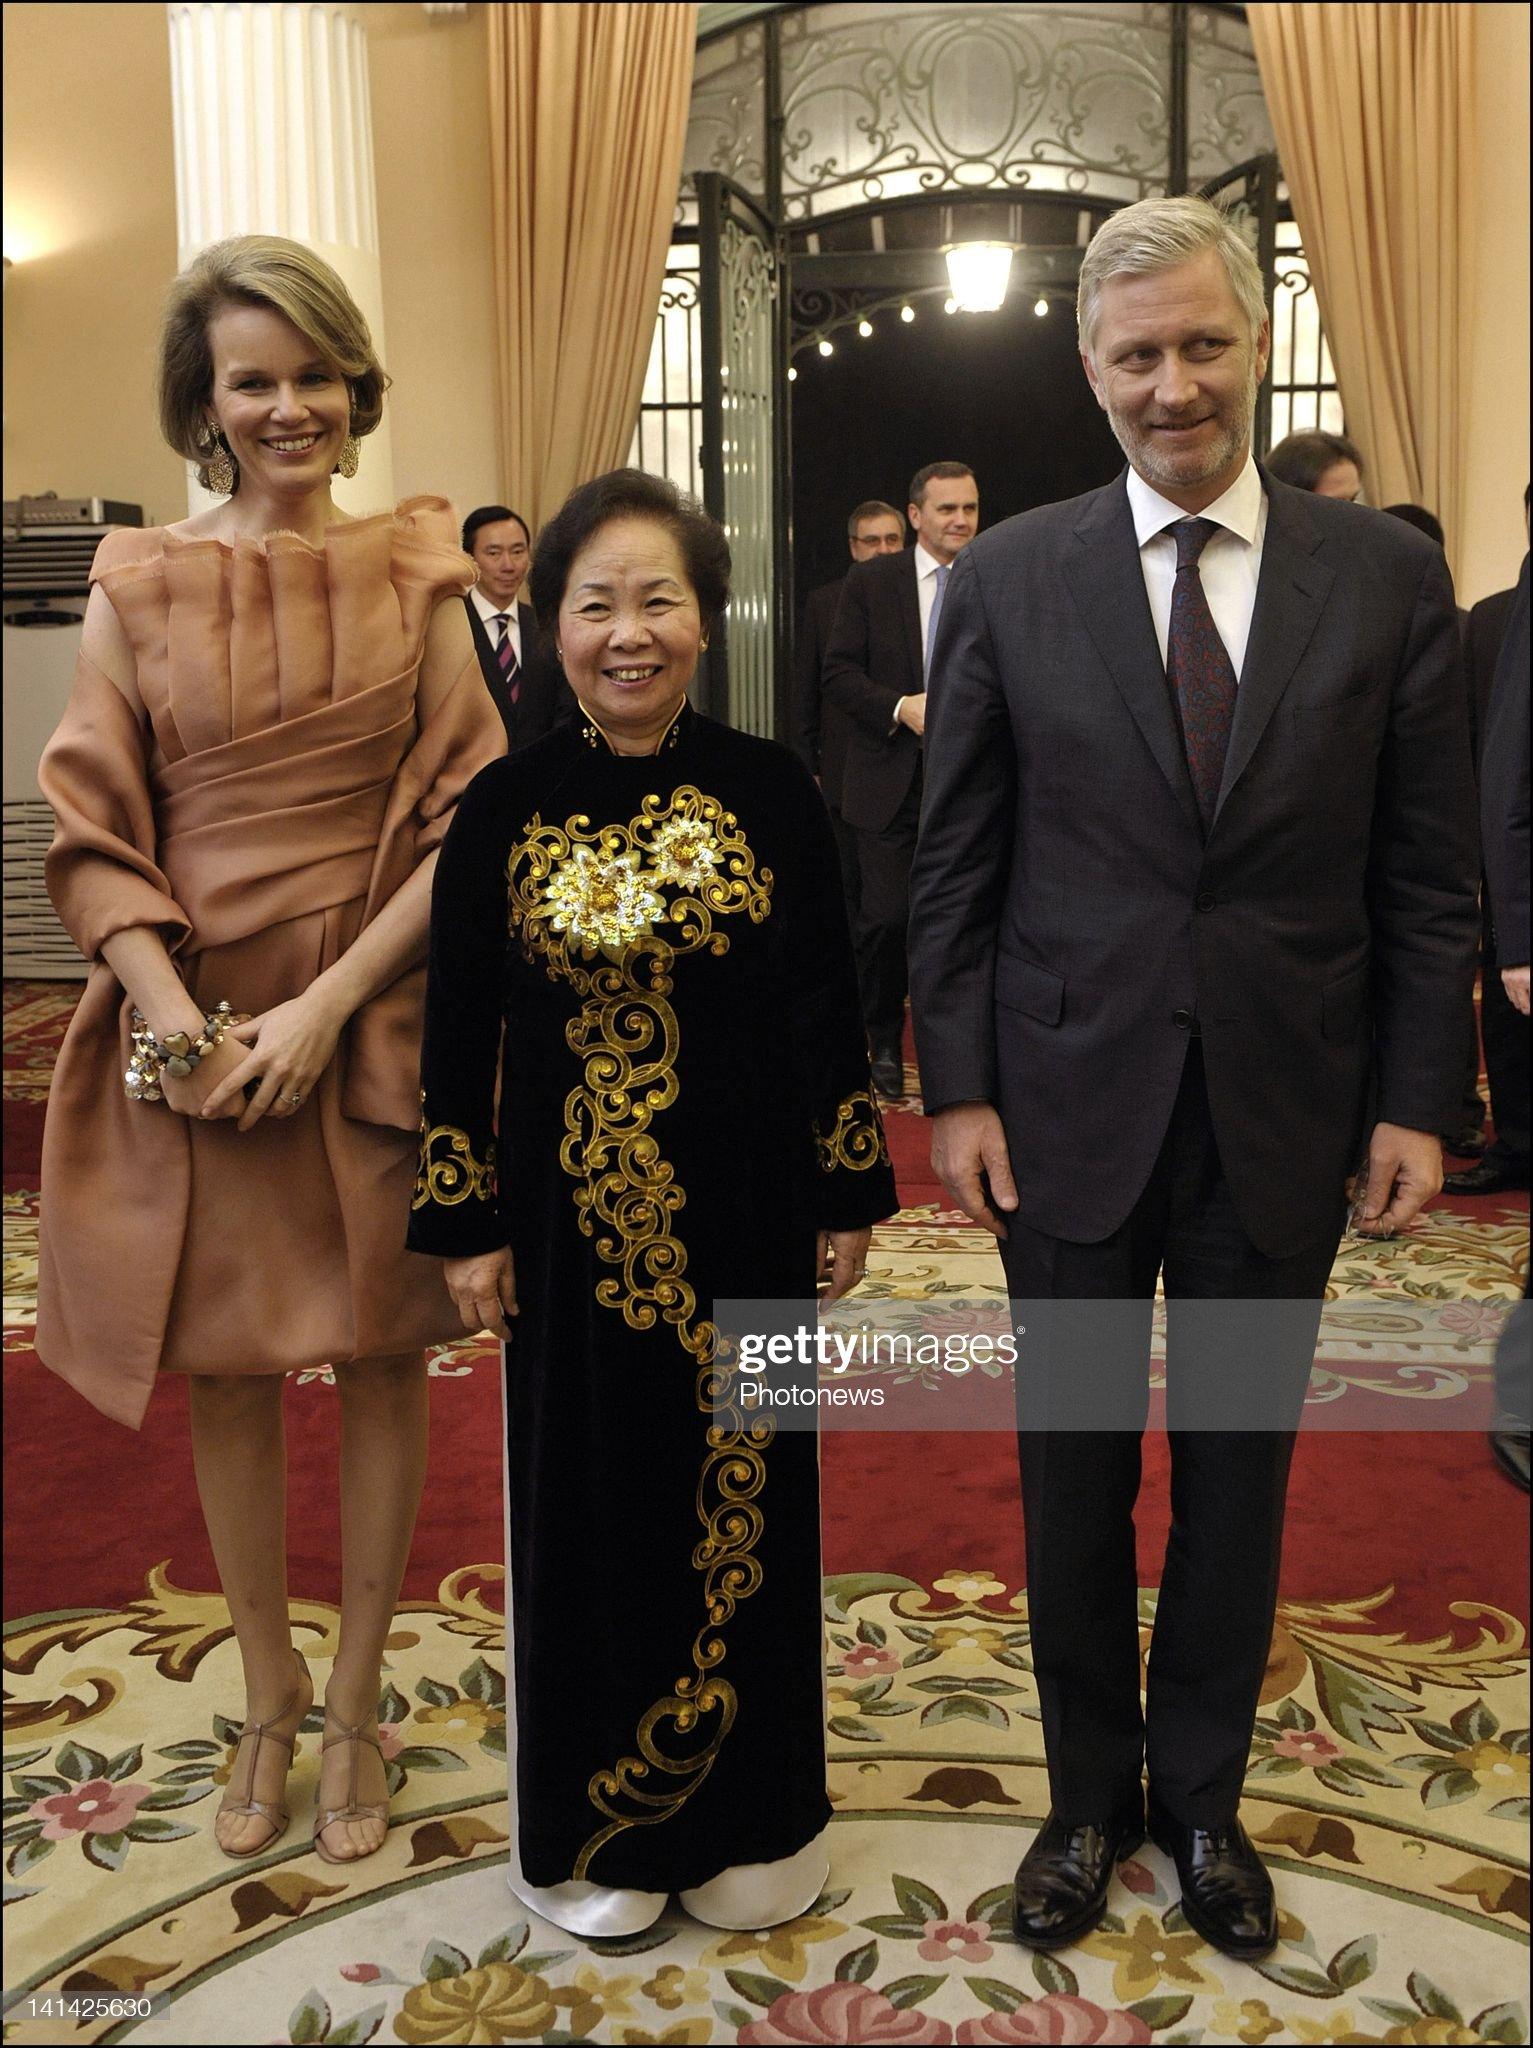 Вечерние наряды Королевы Матильды Prince Philip and Princess Mathilde of Belgium Official Visit to Vietnam - Day 2 : News Photo